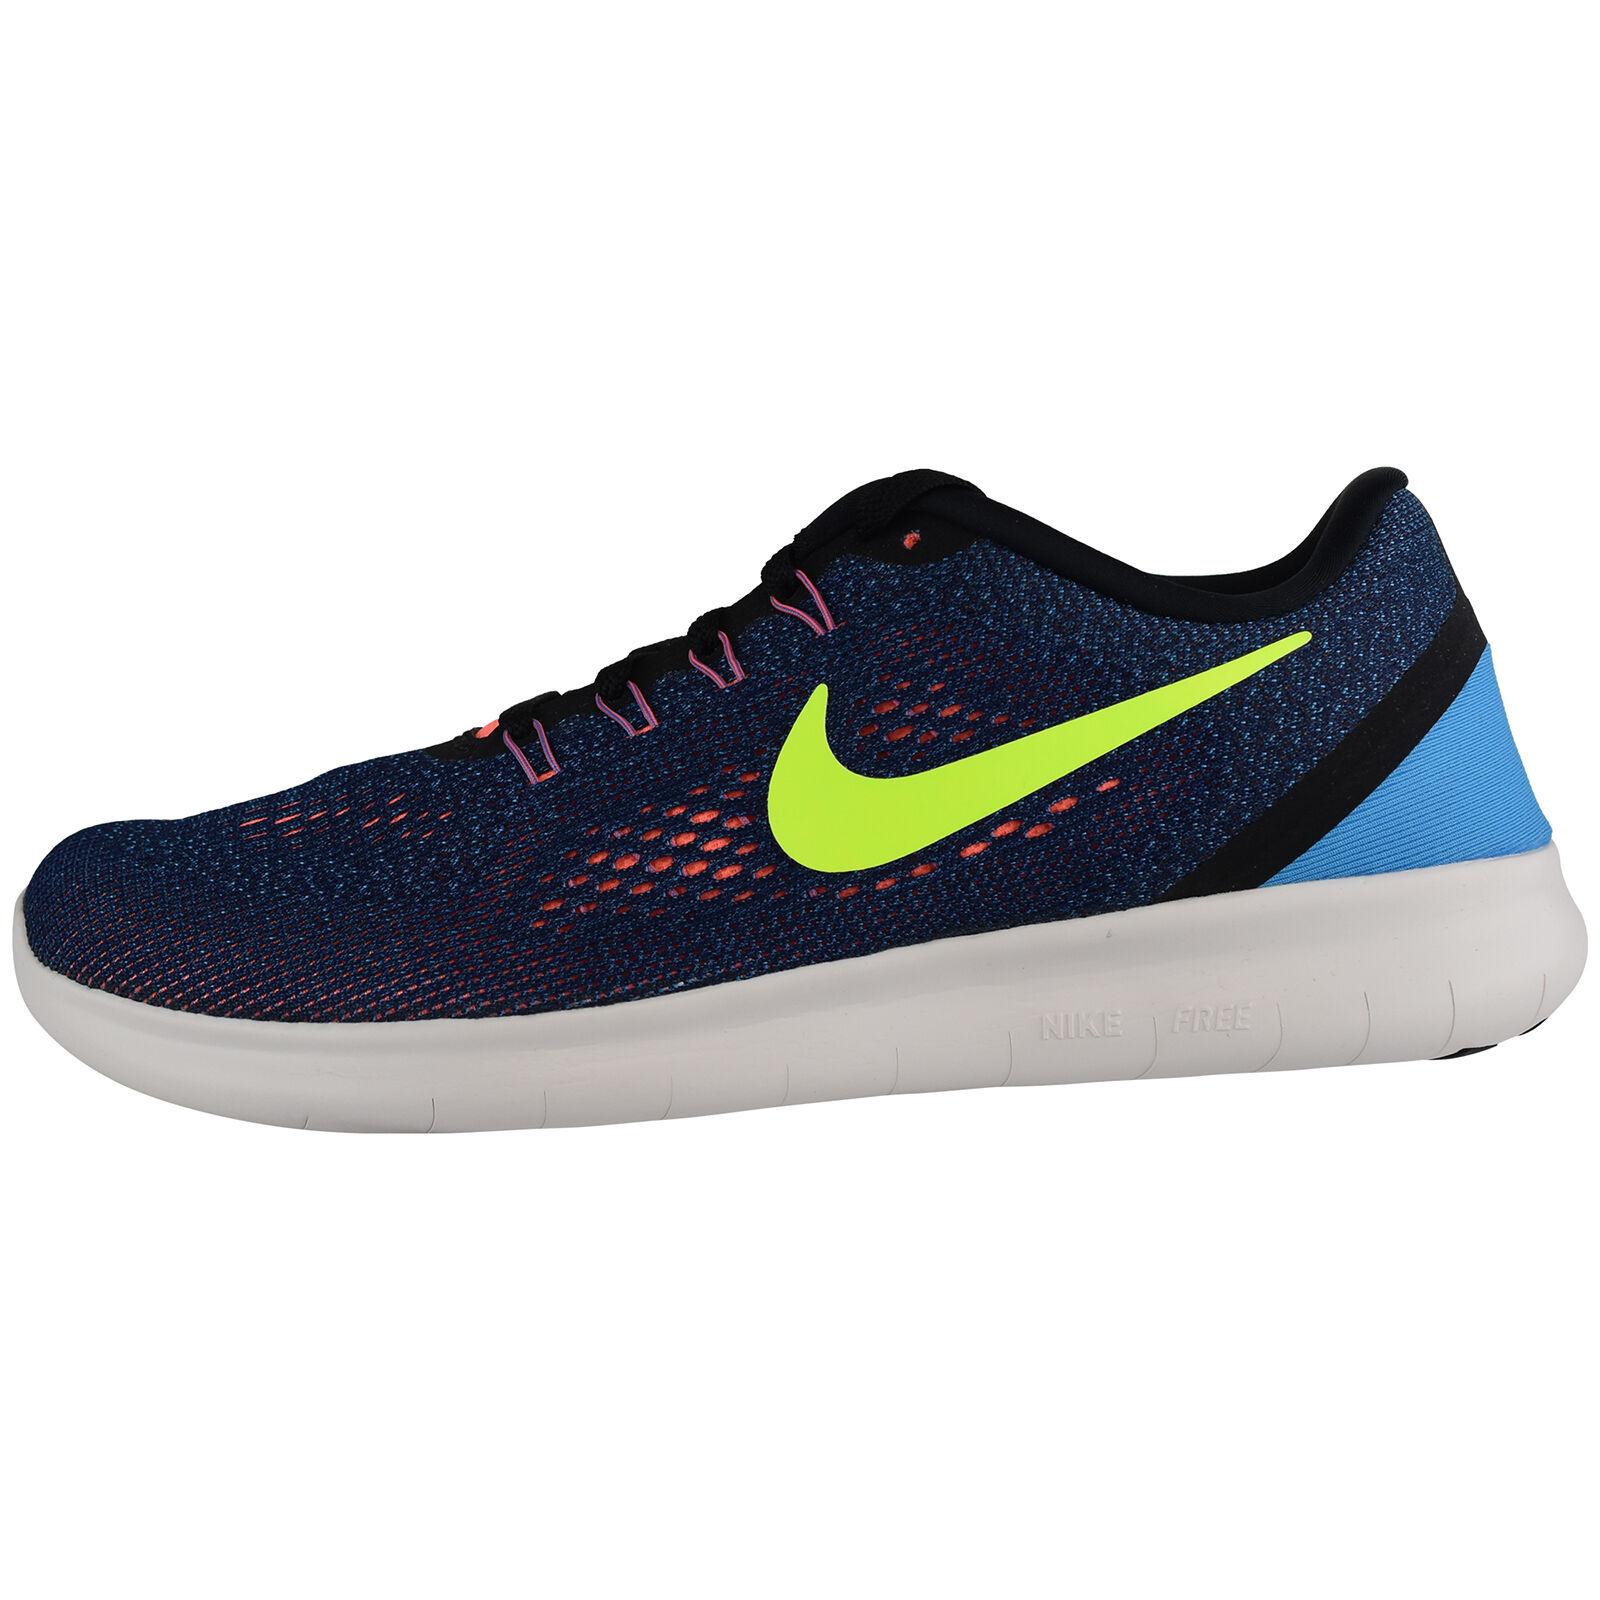 WMNS Nike Free RN 831509-501 Lifestyle Laufschuhe Running Freizeit Turnschuhe